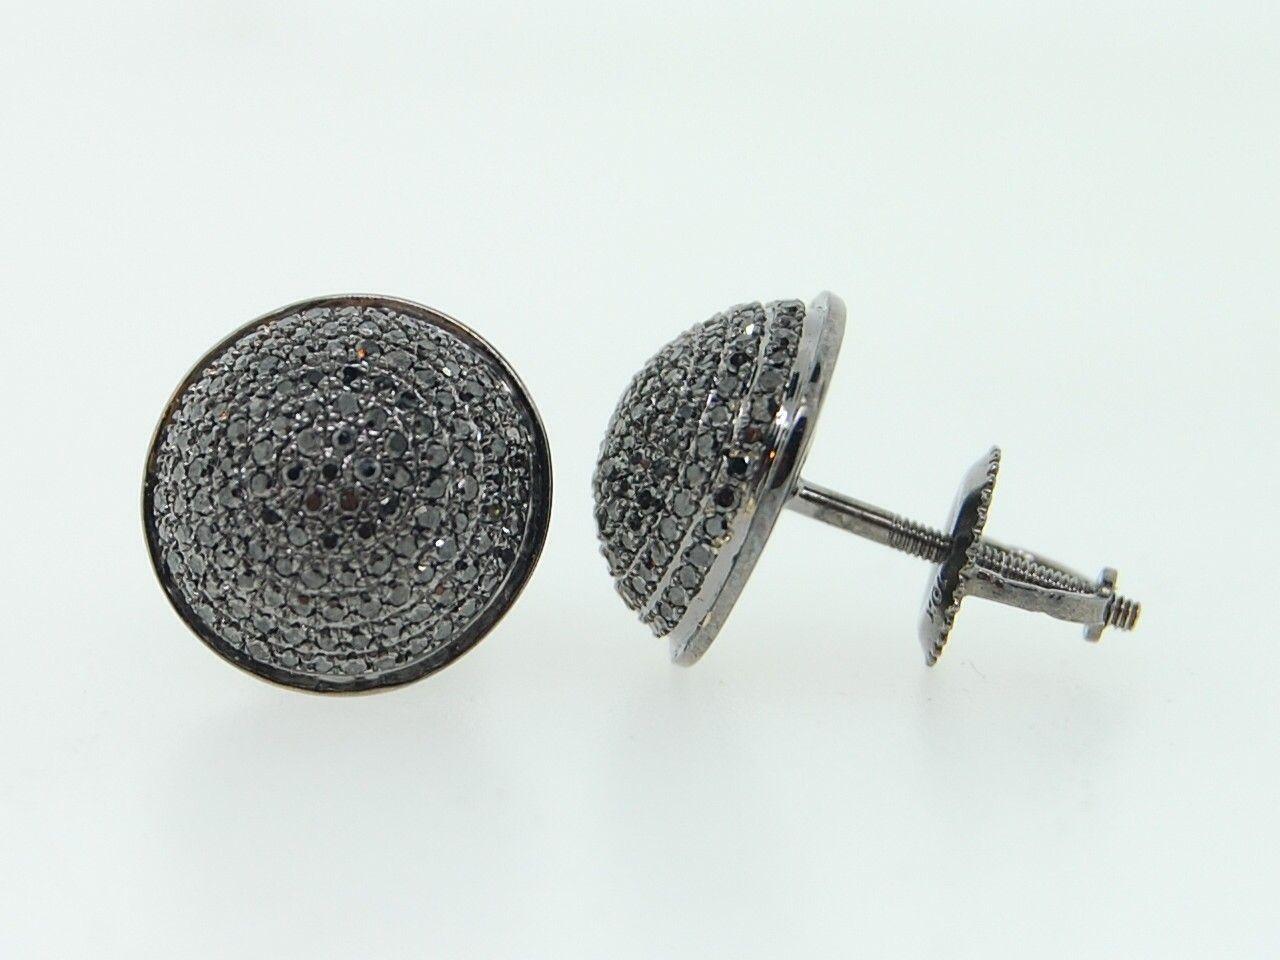 Diamond Stud Earrings For Men Hd Real Black